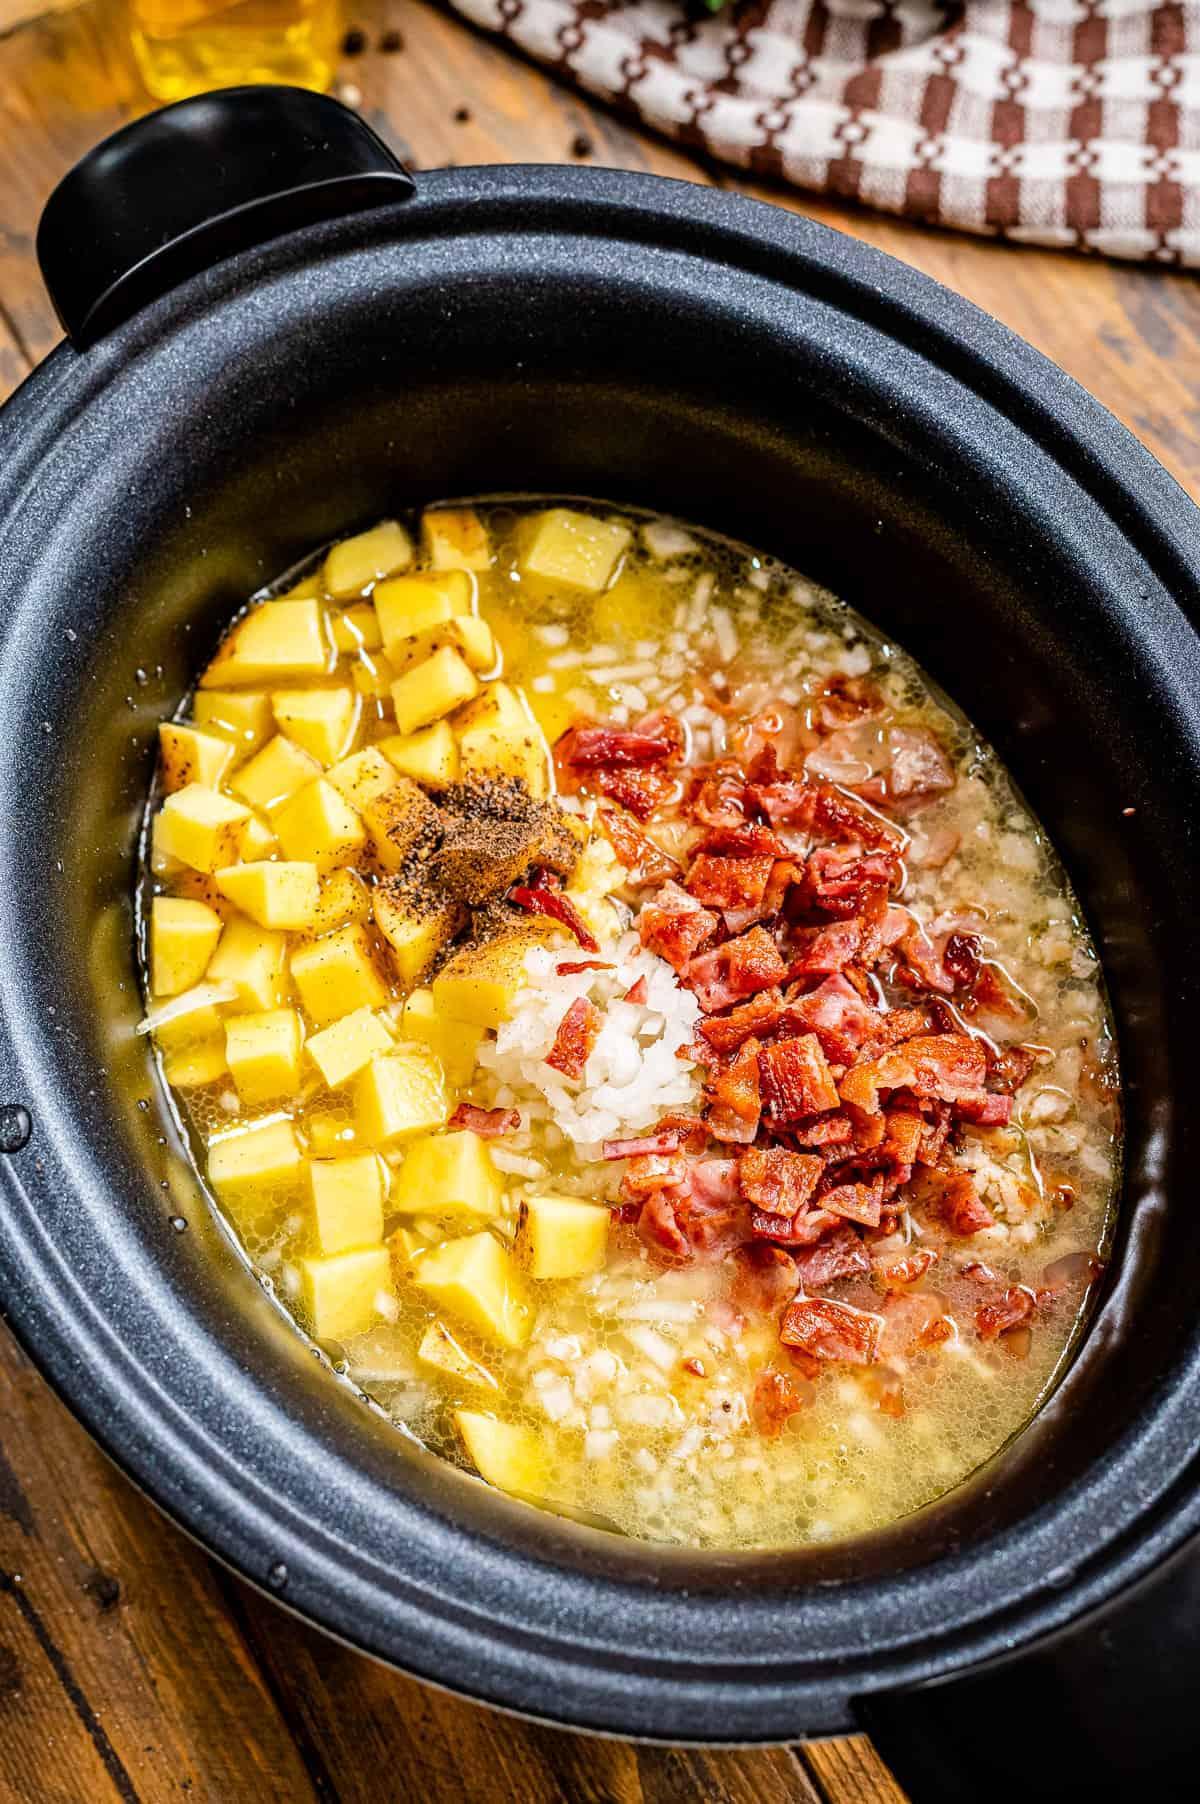 Ingredients in black crock pot to make zuppa toscana